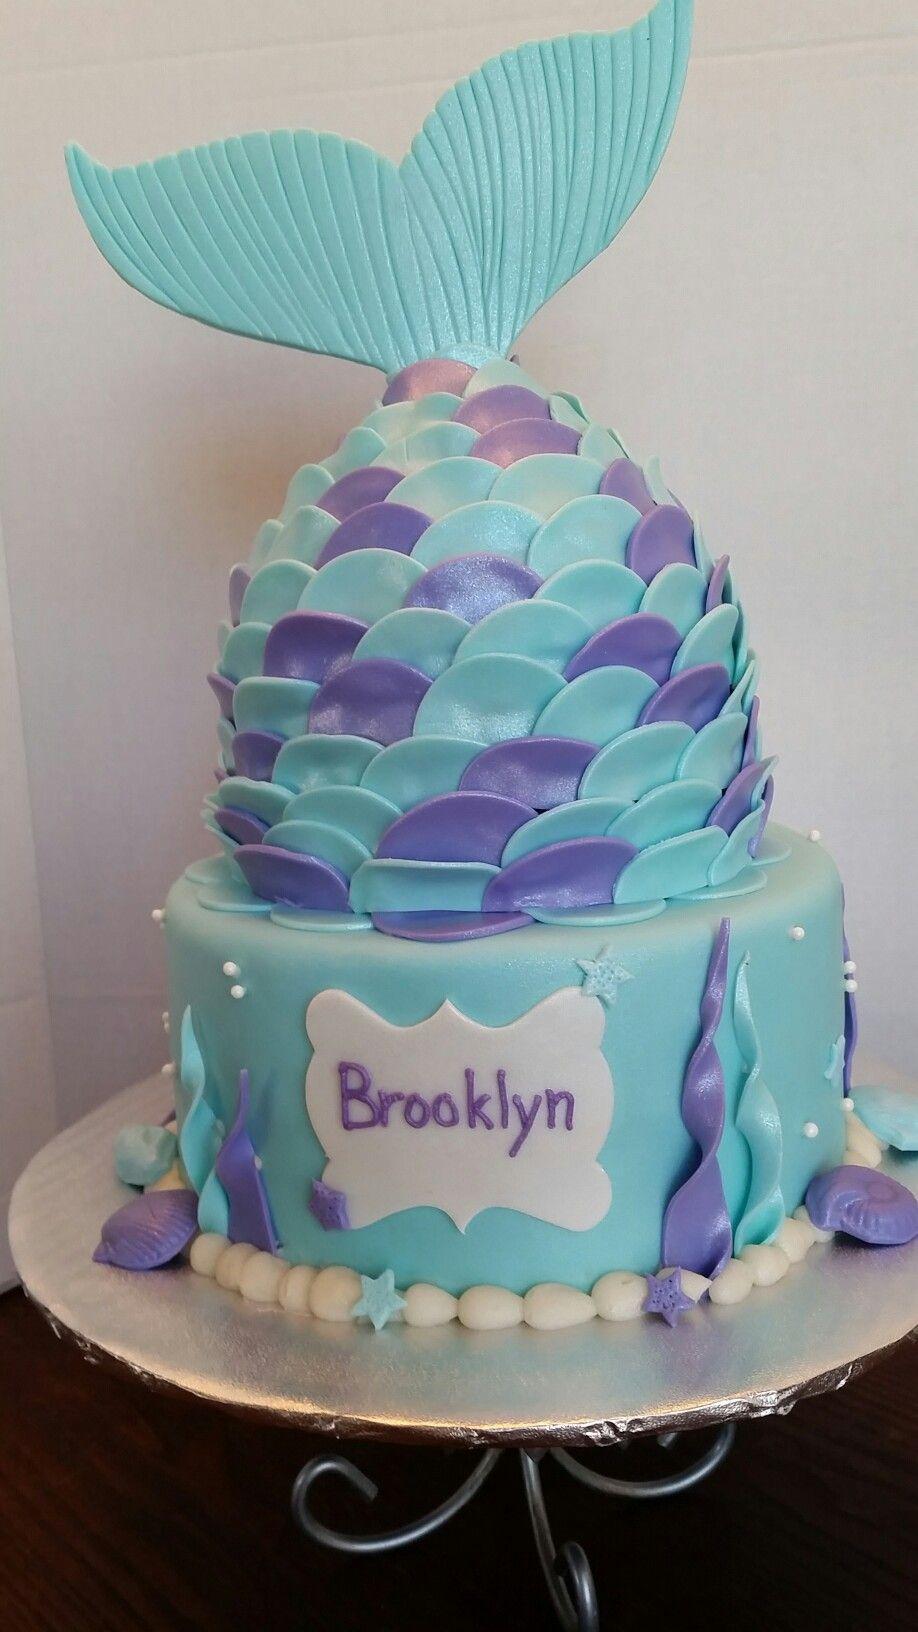 Mermaid Tail Cake 6th Birthday Cakes Tea Party Birthday